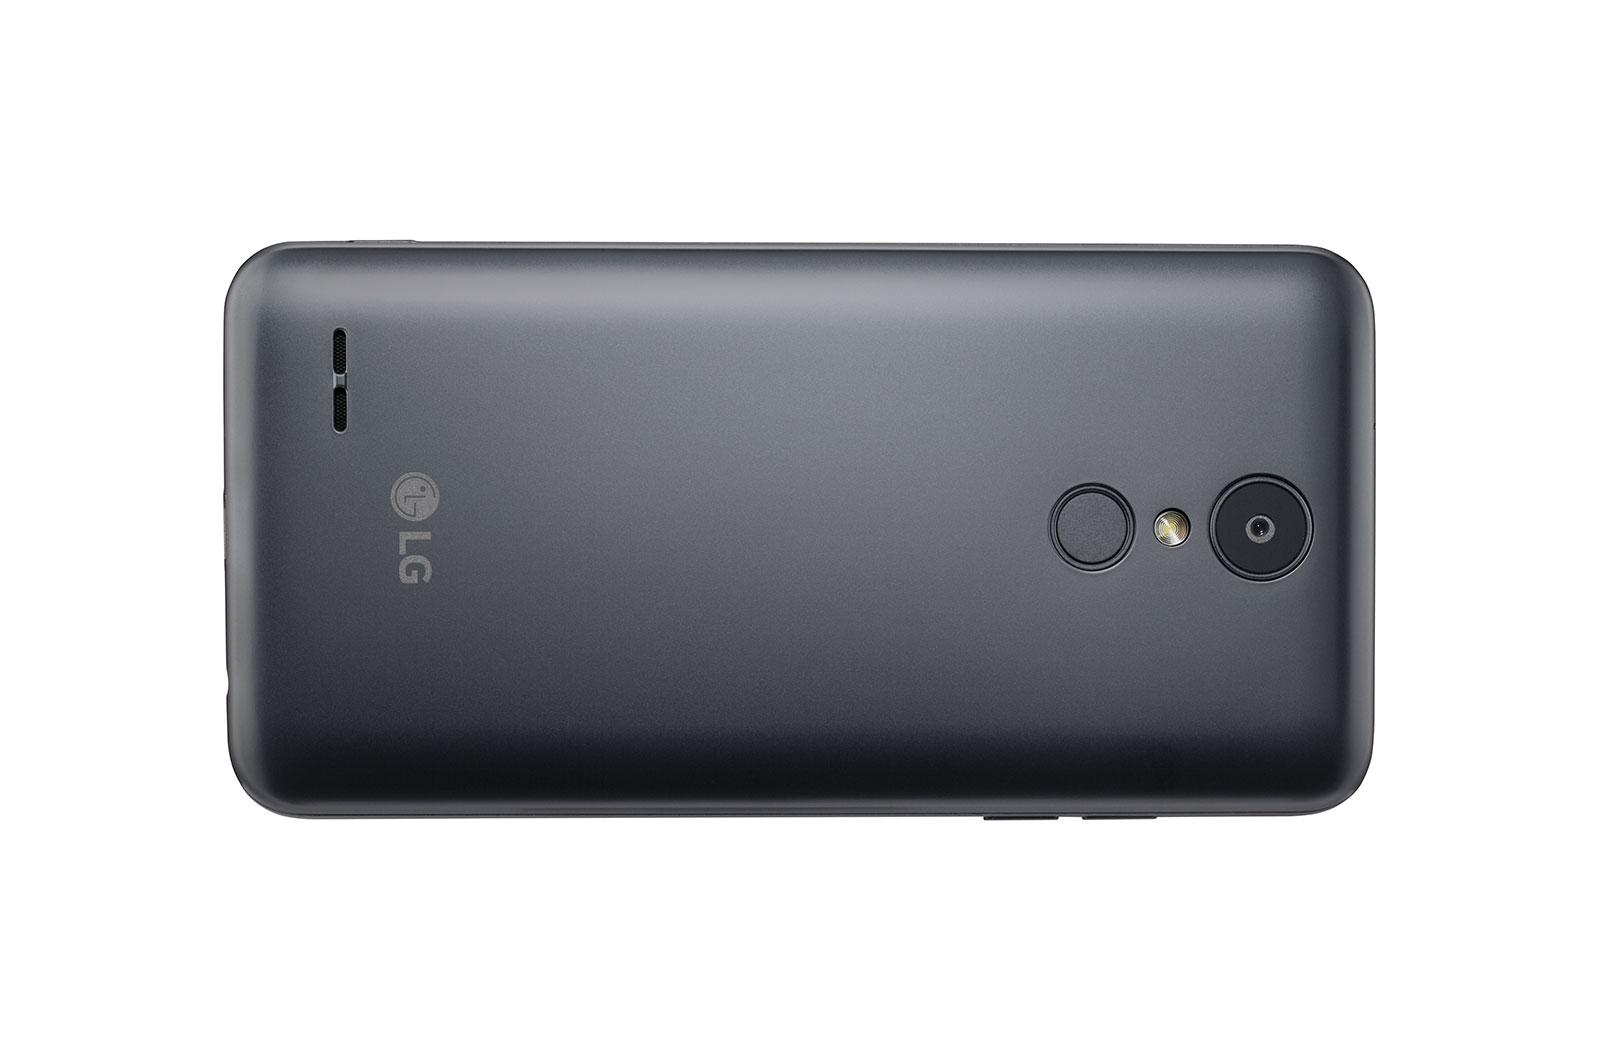 LG Aristo 3 camera